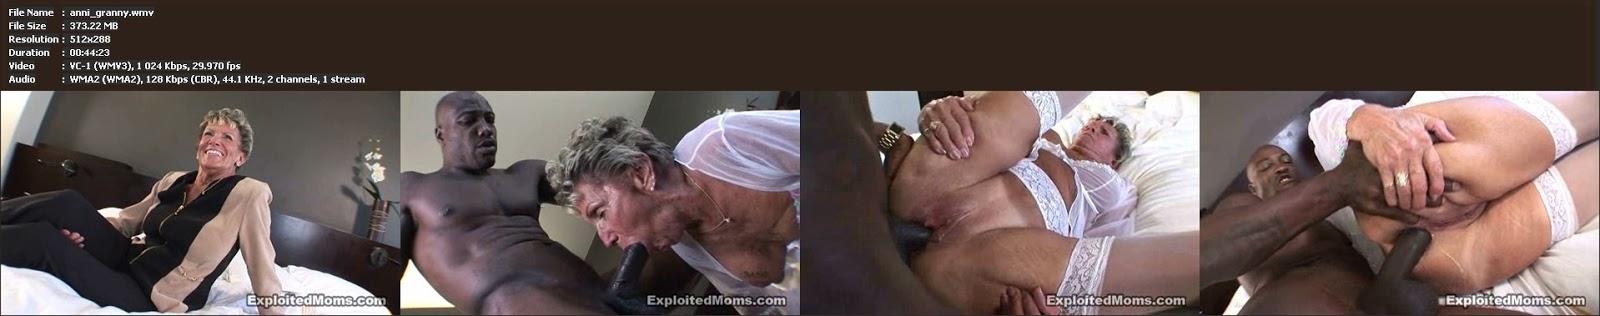 Tits Big Granny anni may from